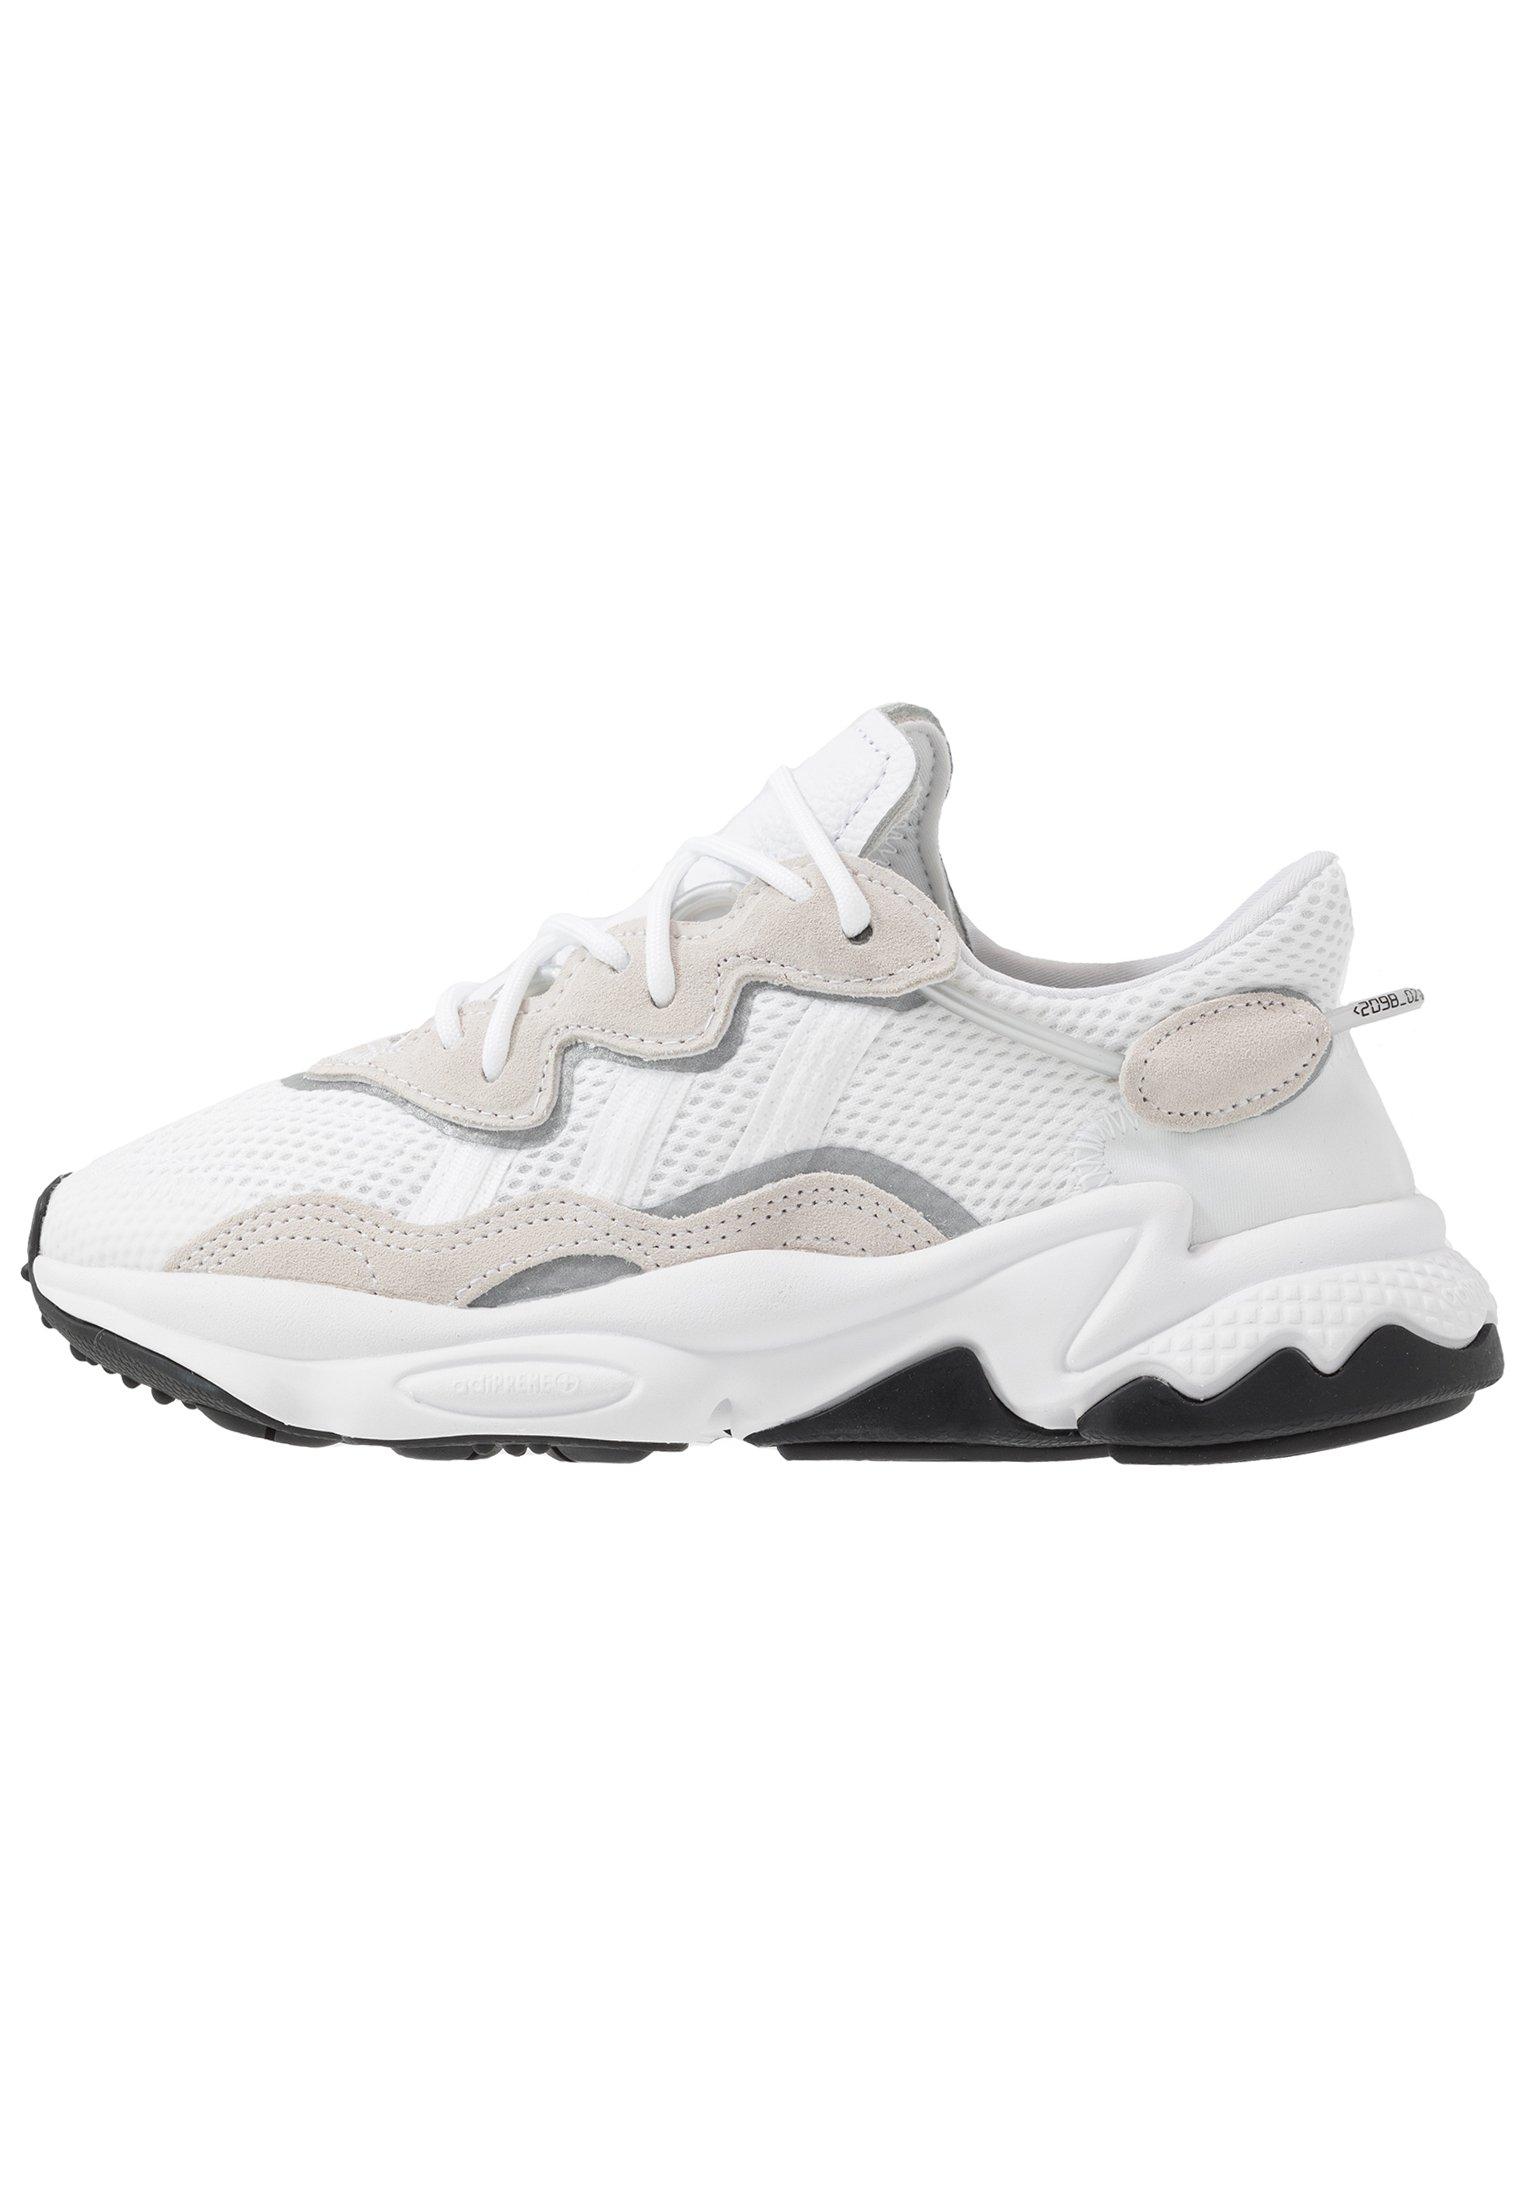 adidas Originals OZWEEGO - Zapatillas - ftwwht/ftwwht/cblack ...